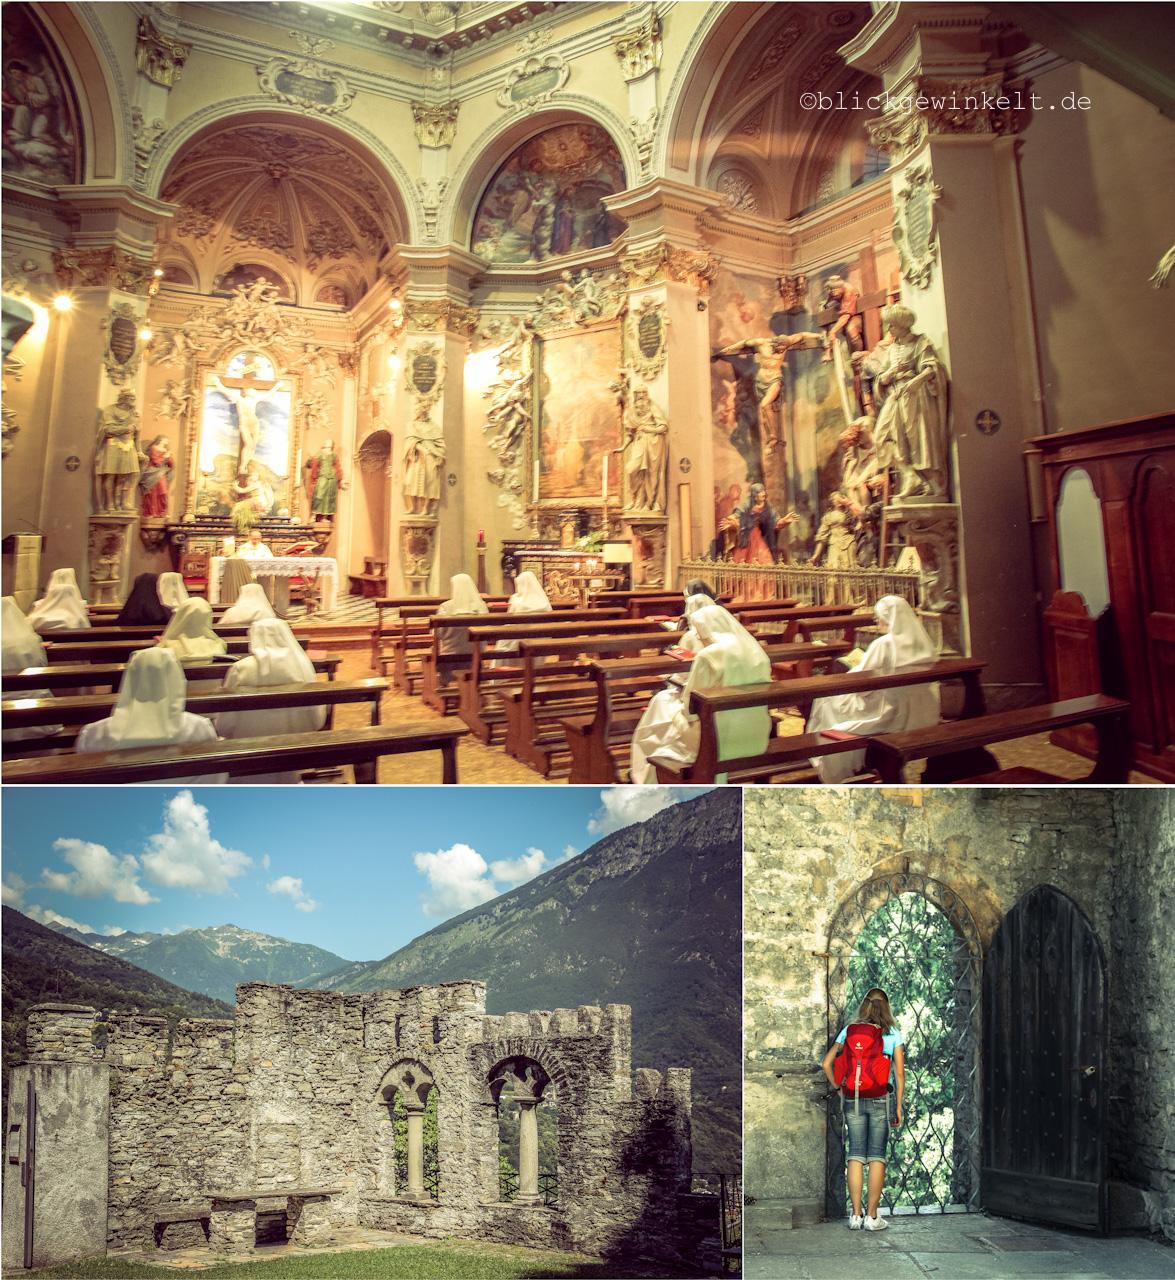 Kapelle in Italien, Piemonte, Kalvarienberg